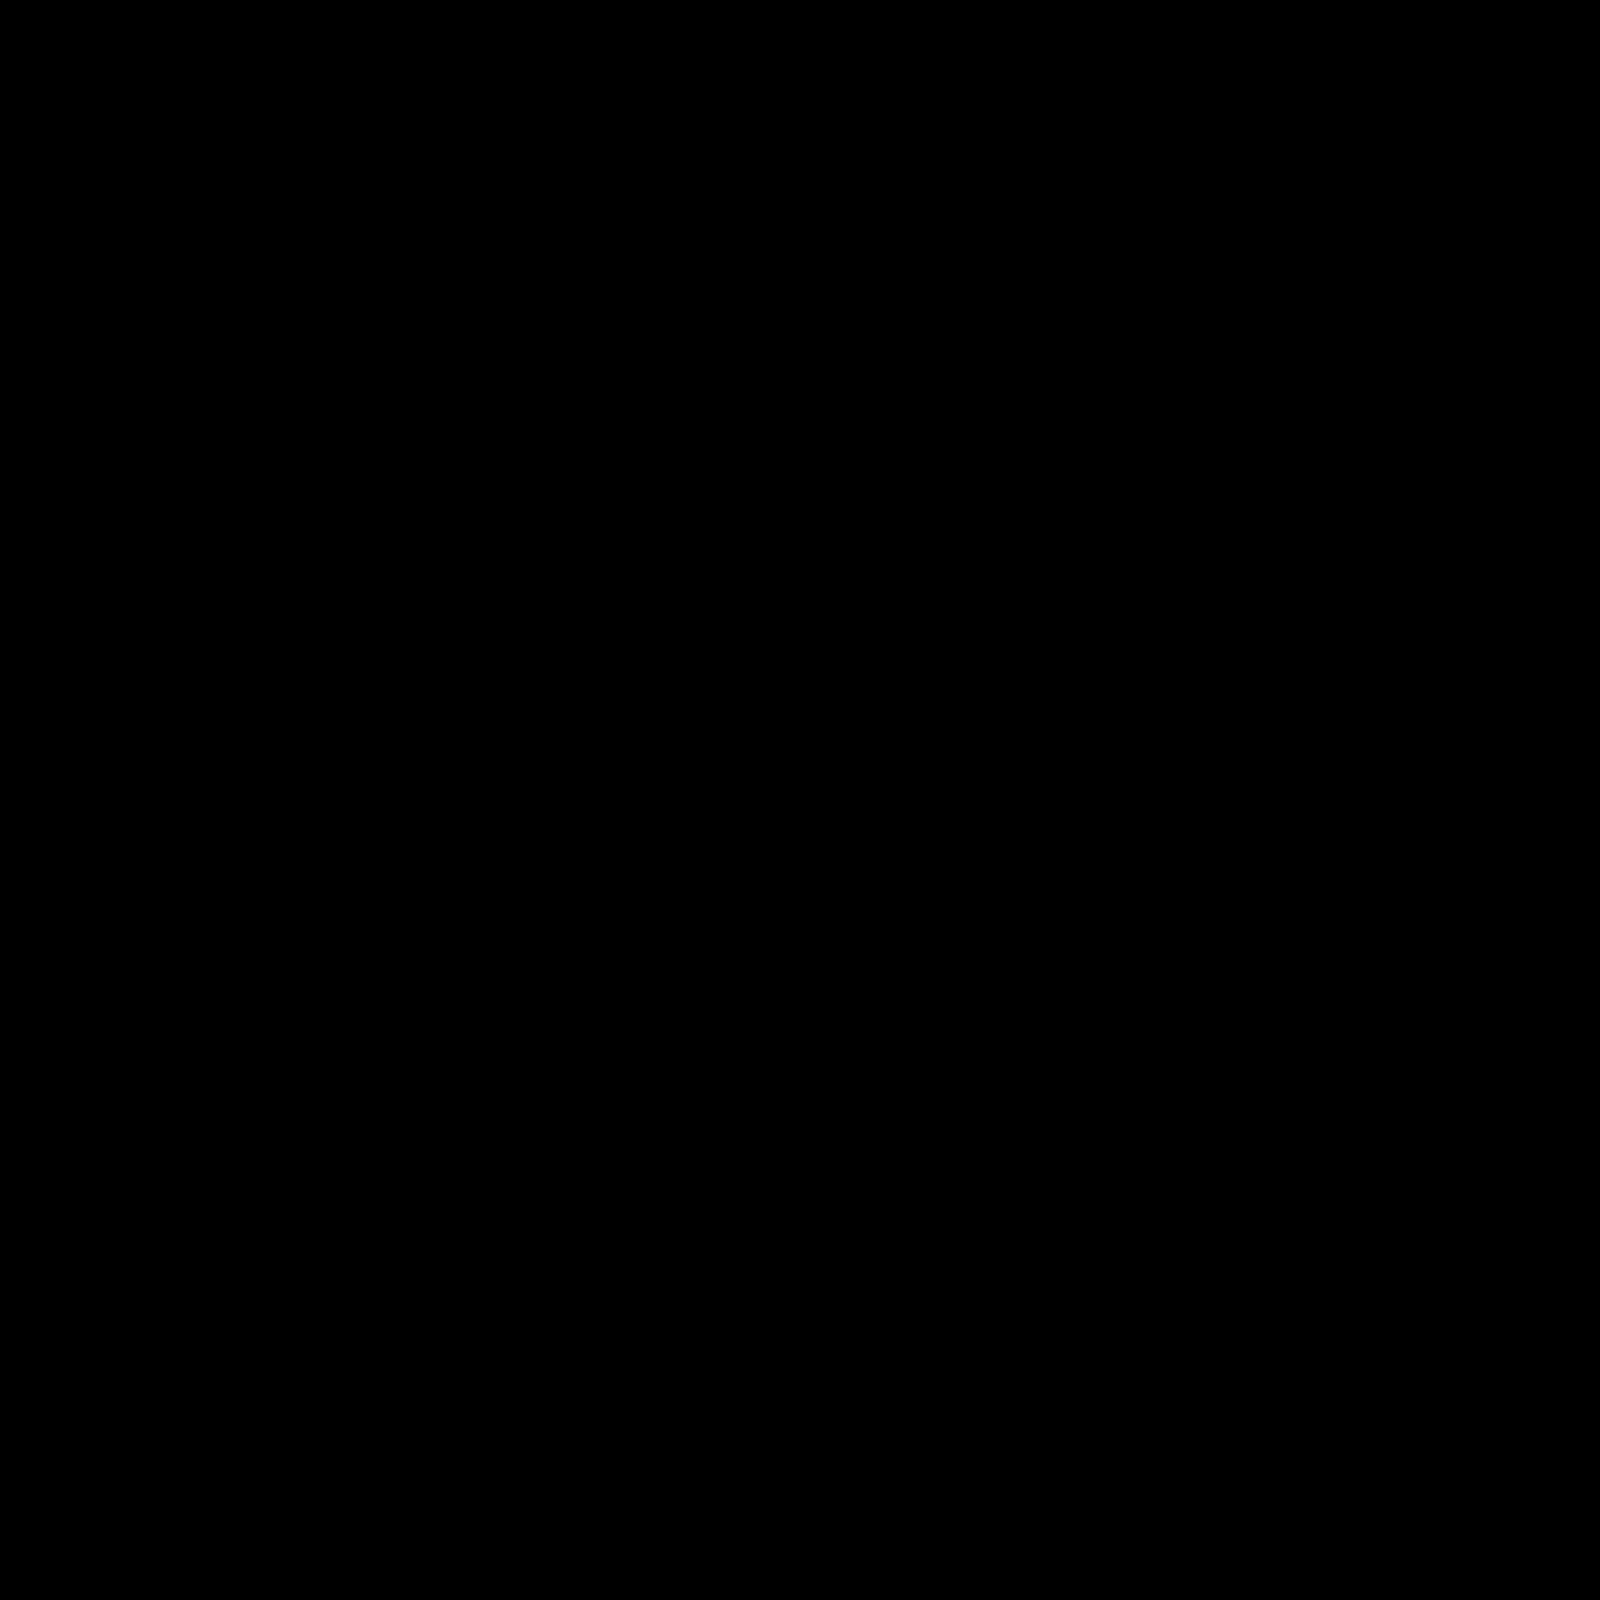 Overwatch icon